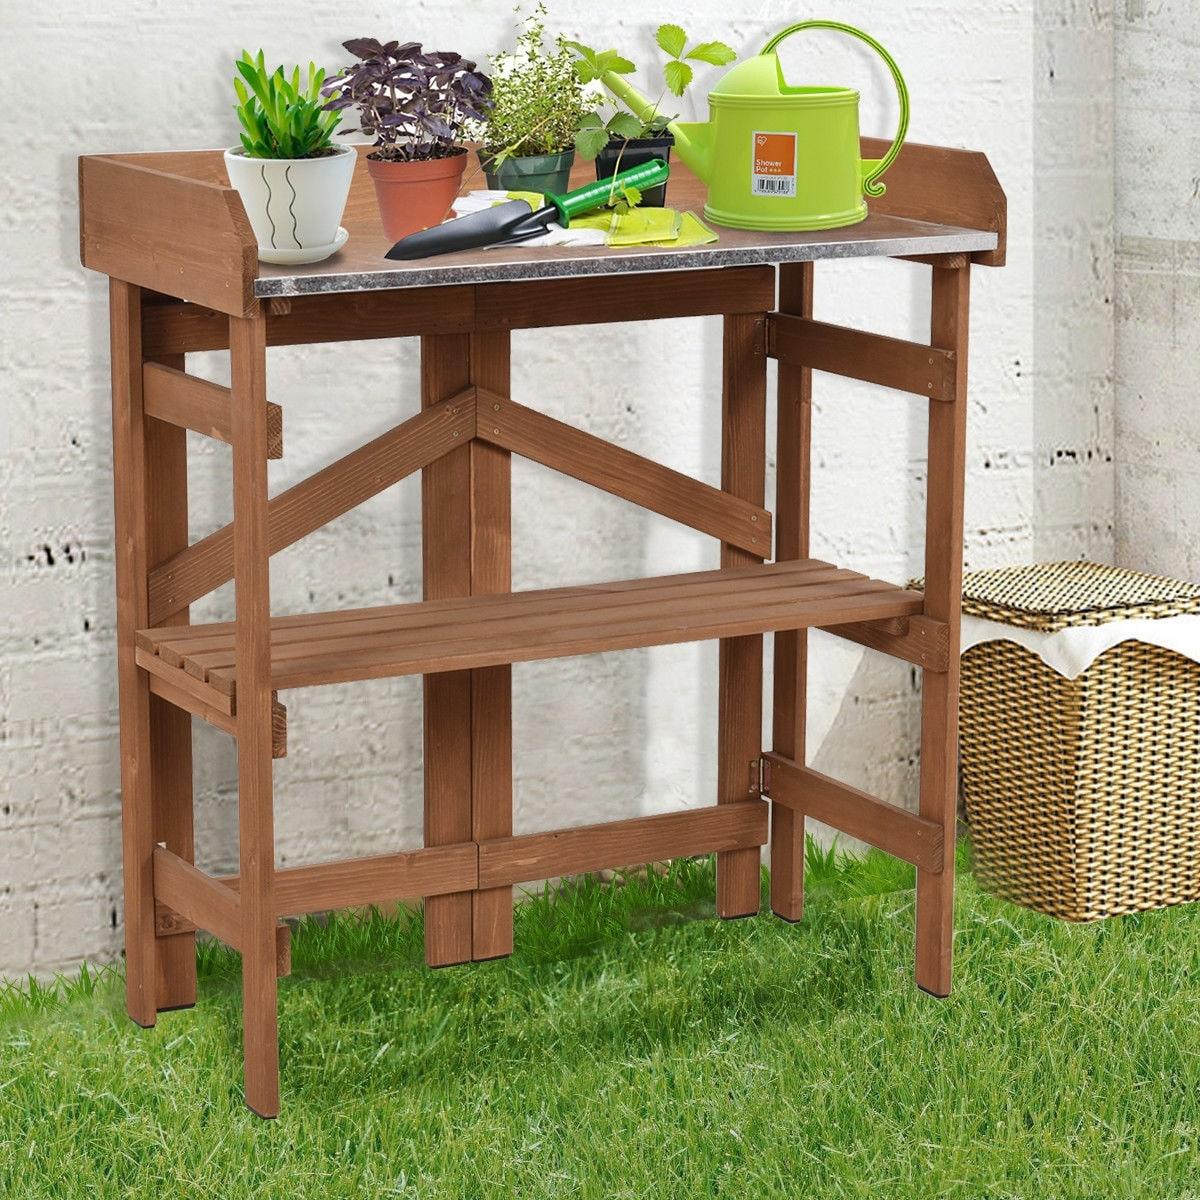 Costway Metal Top Wooden Potting Bench Garden Planting Workstation Shelves  - as pic